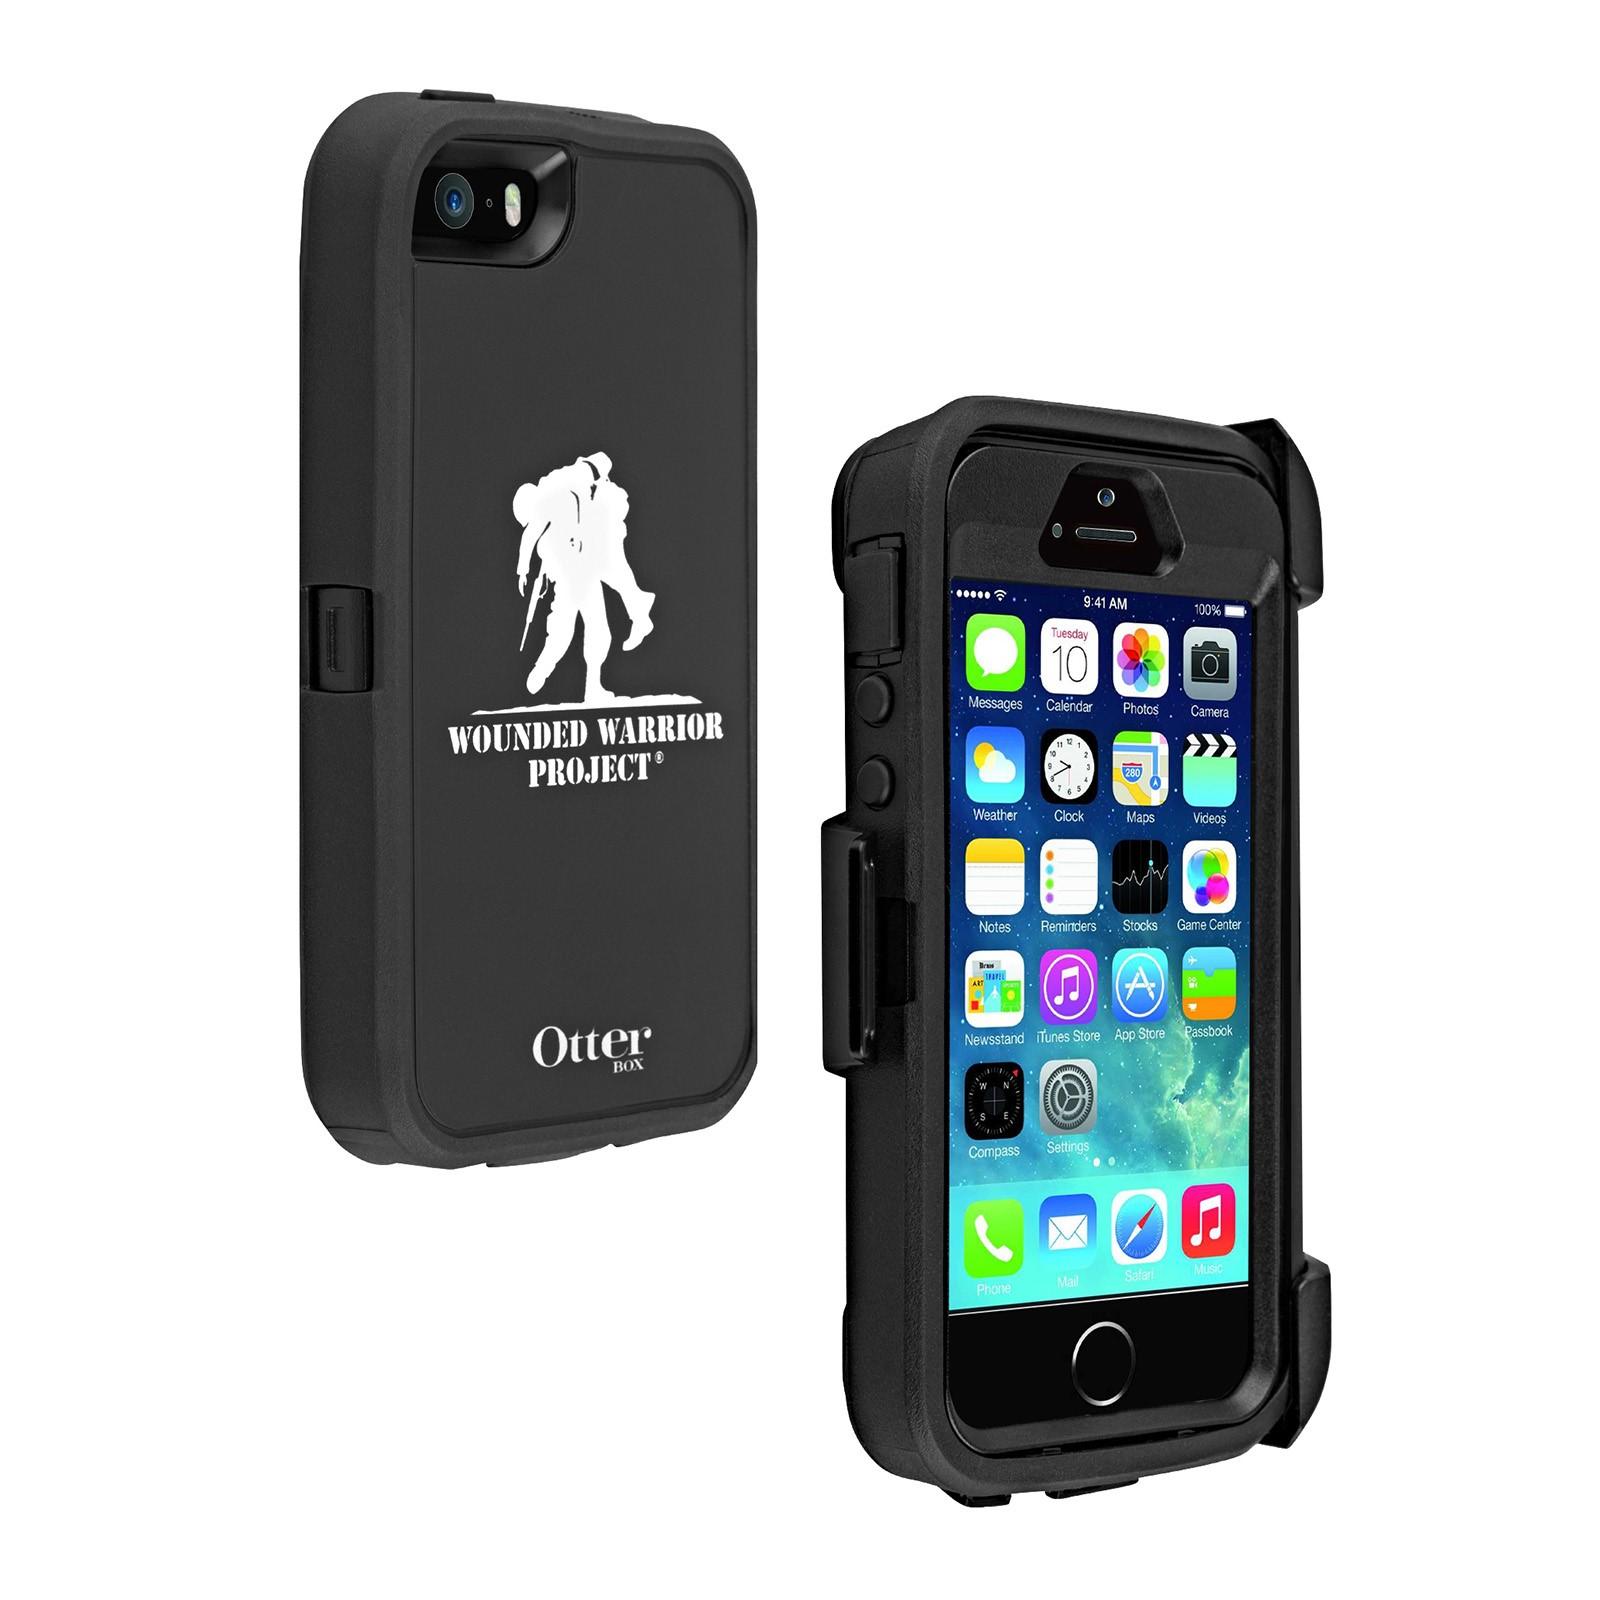 OtterboxDefenderSeriesCaseForAppleIphoneSe5s5